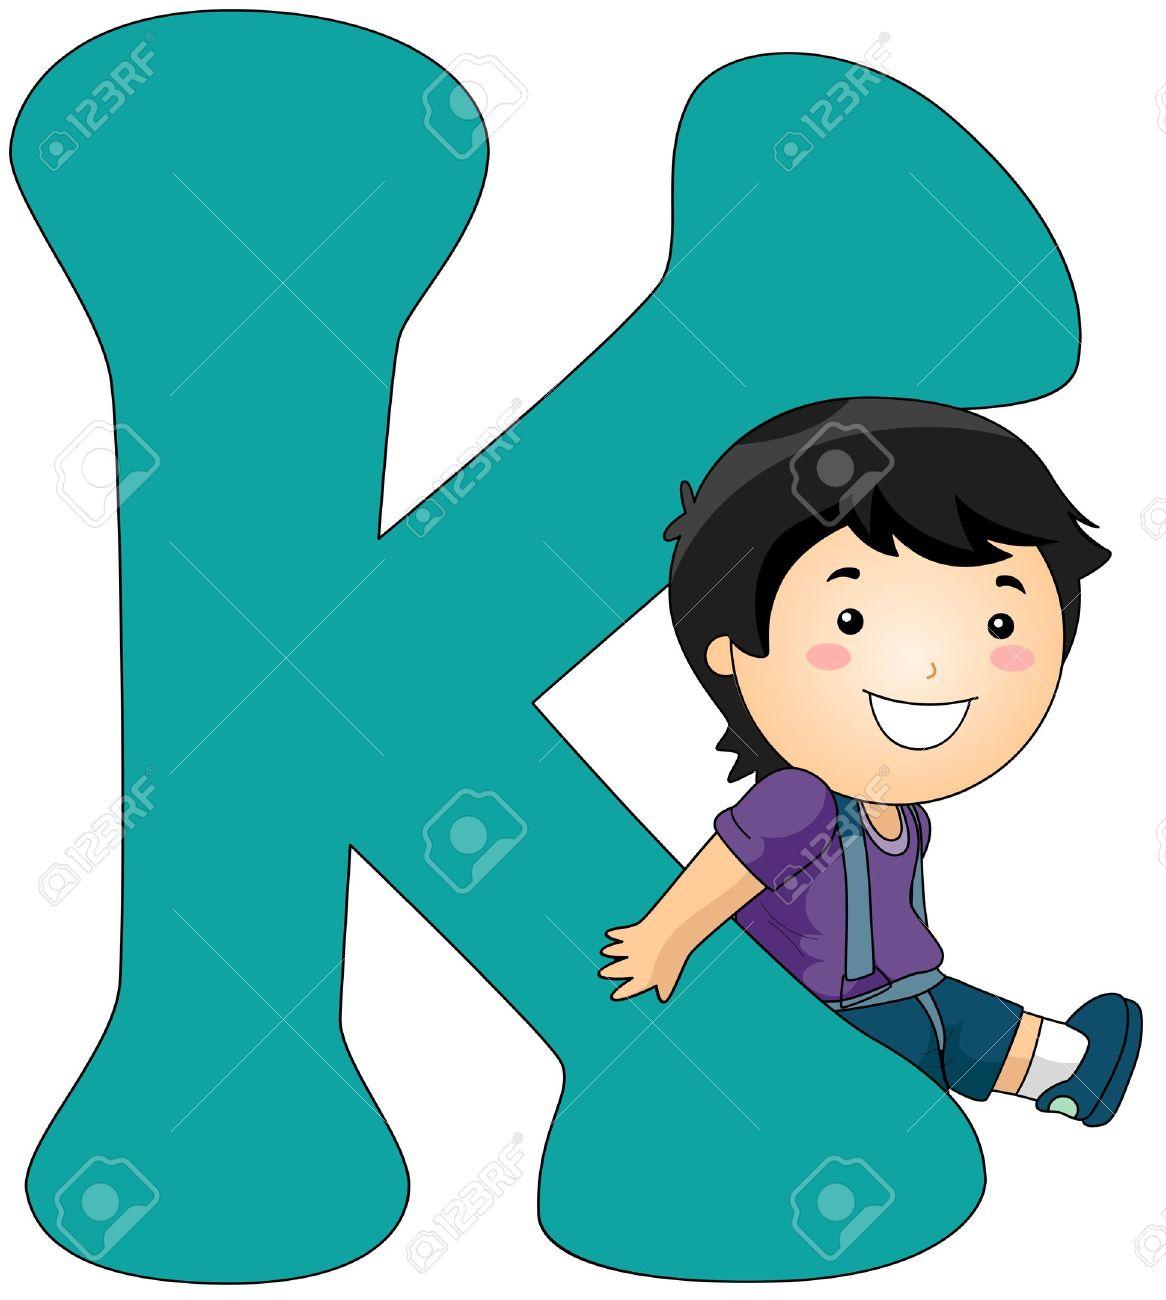 Leaning Against a Letter K .-Leaning Against a Letter K .-19